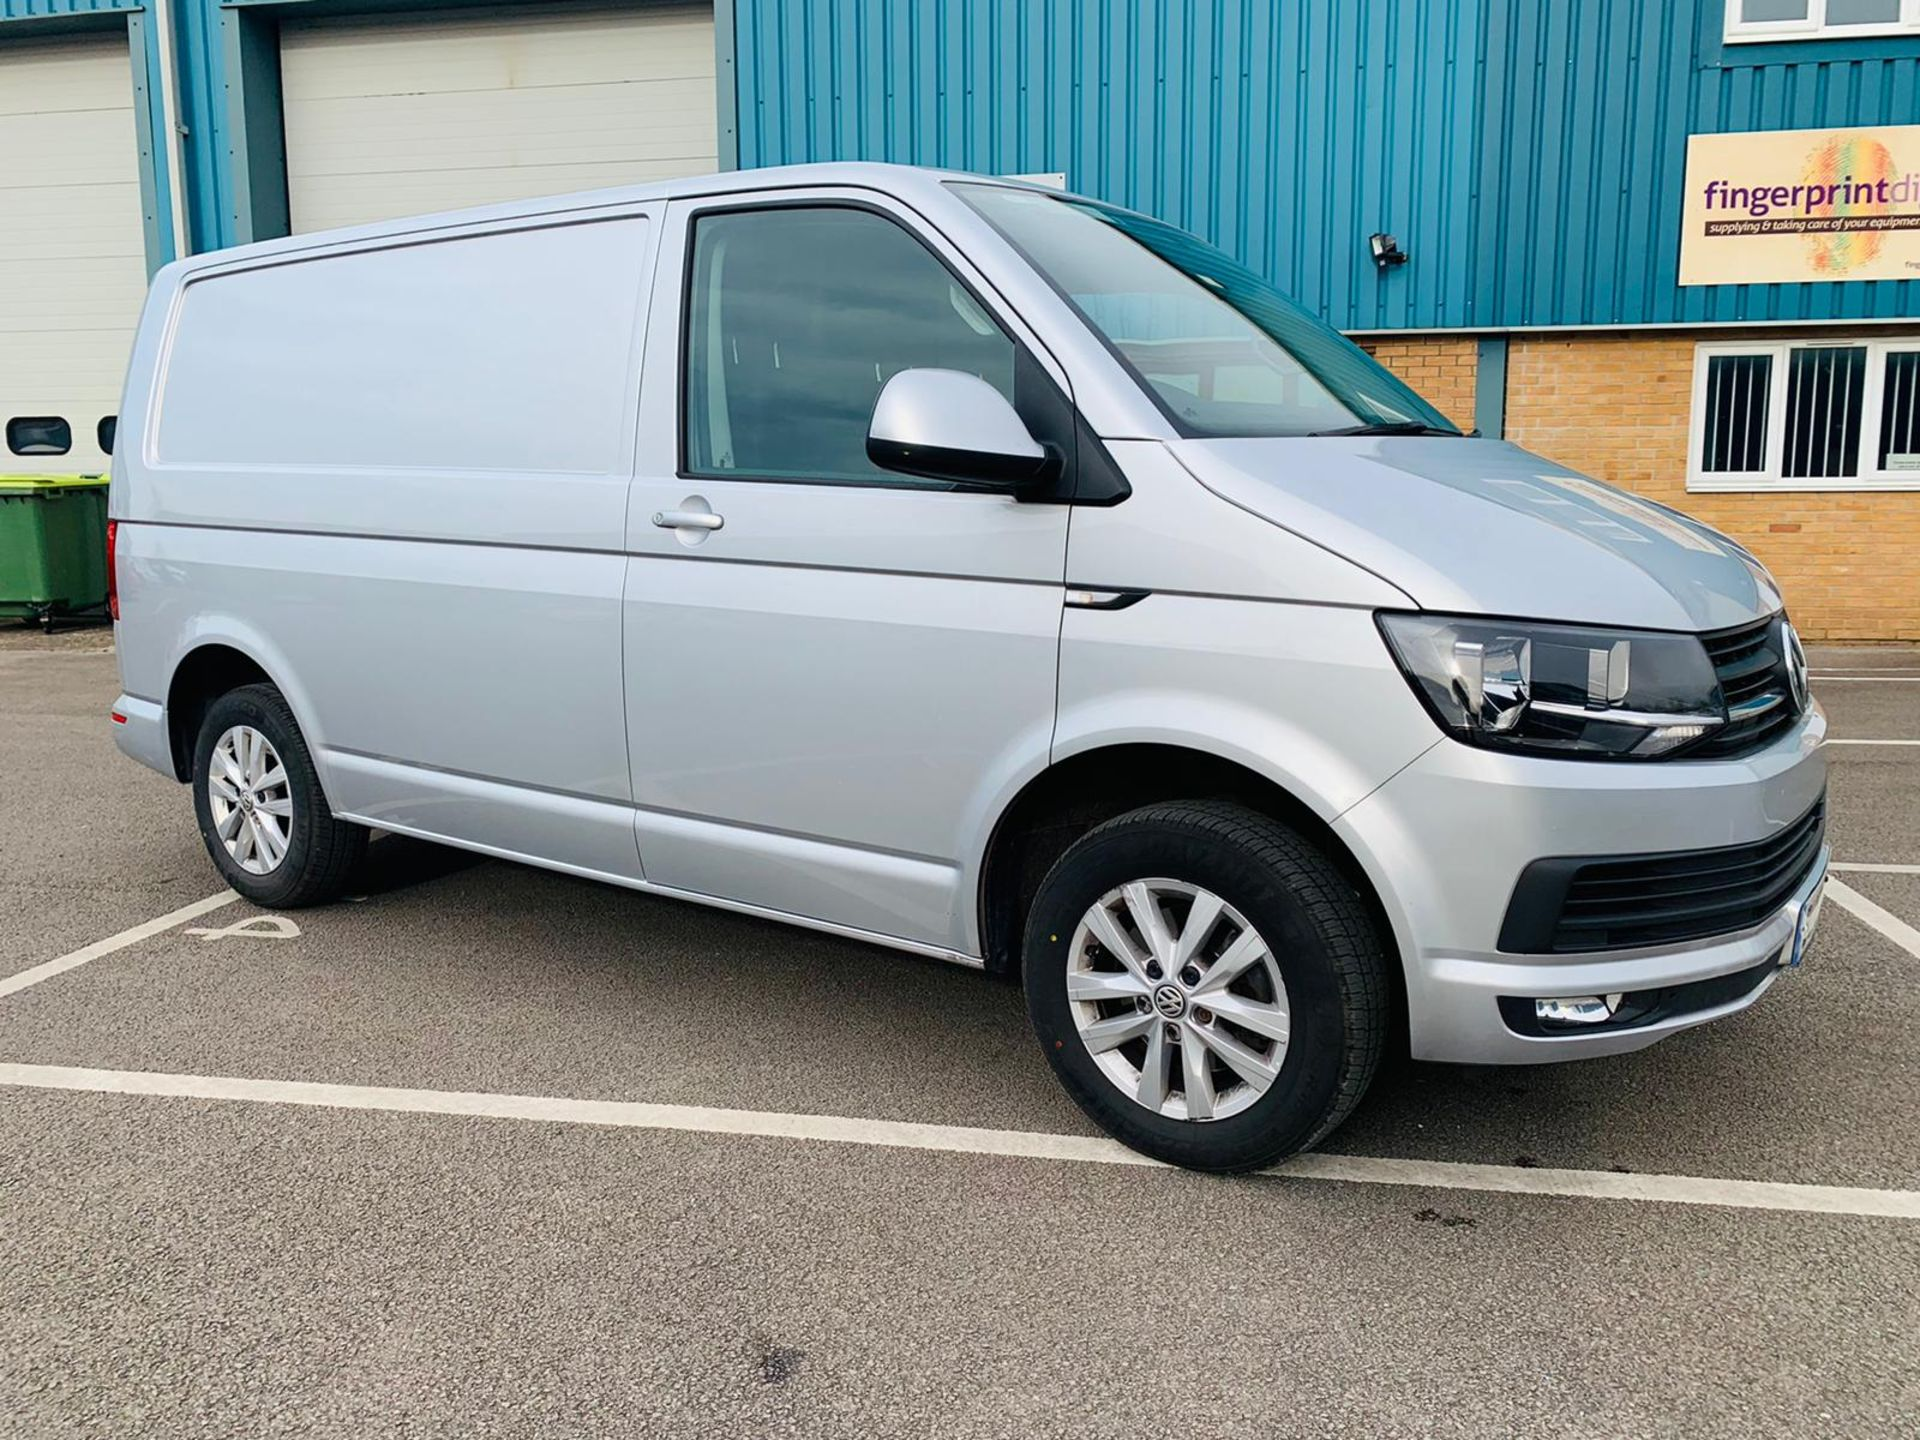 (RESERVE MET) Volkswagen (VW) Transporter 2.0 TDI 150 Highline T28 2018 18 Reg - Parking Sensors -